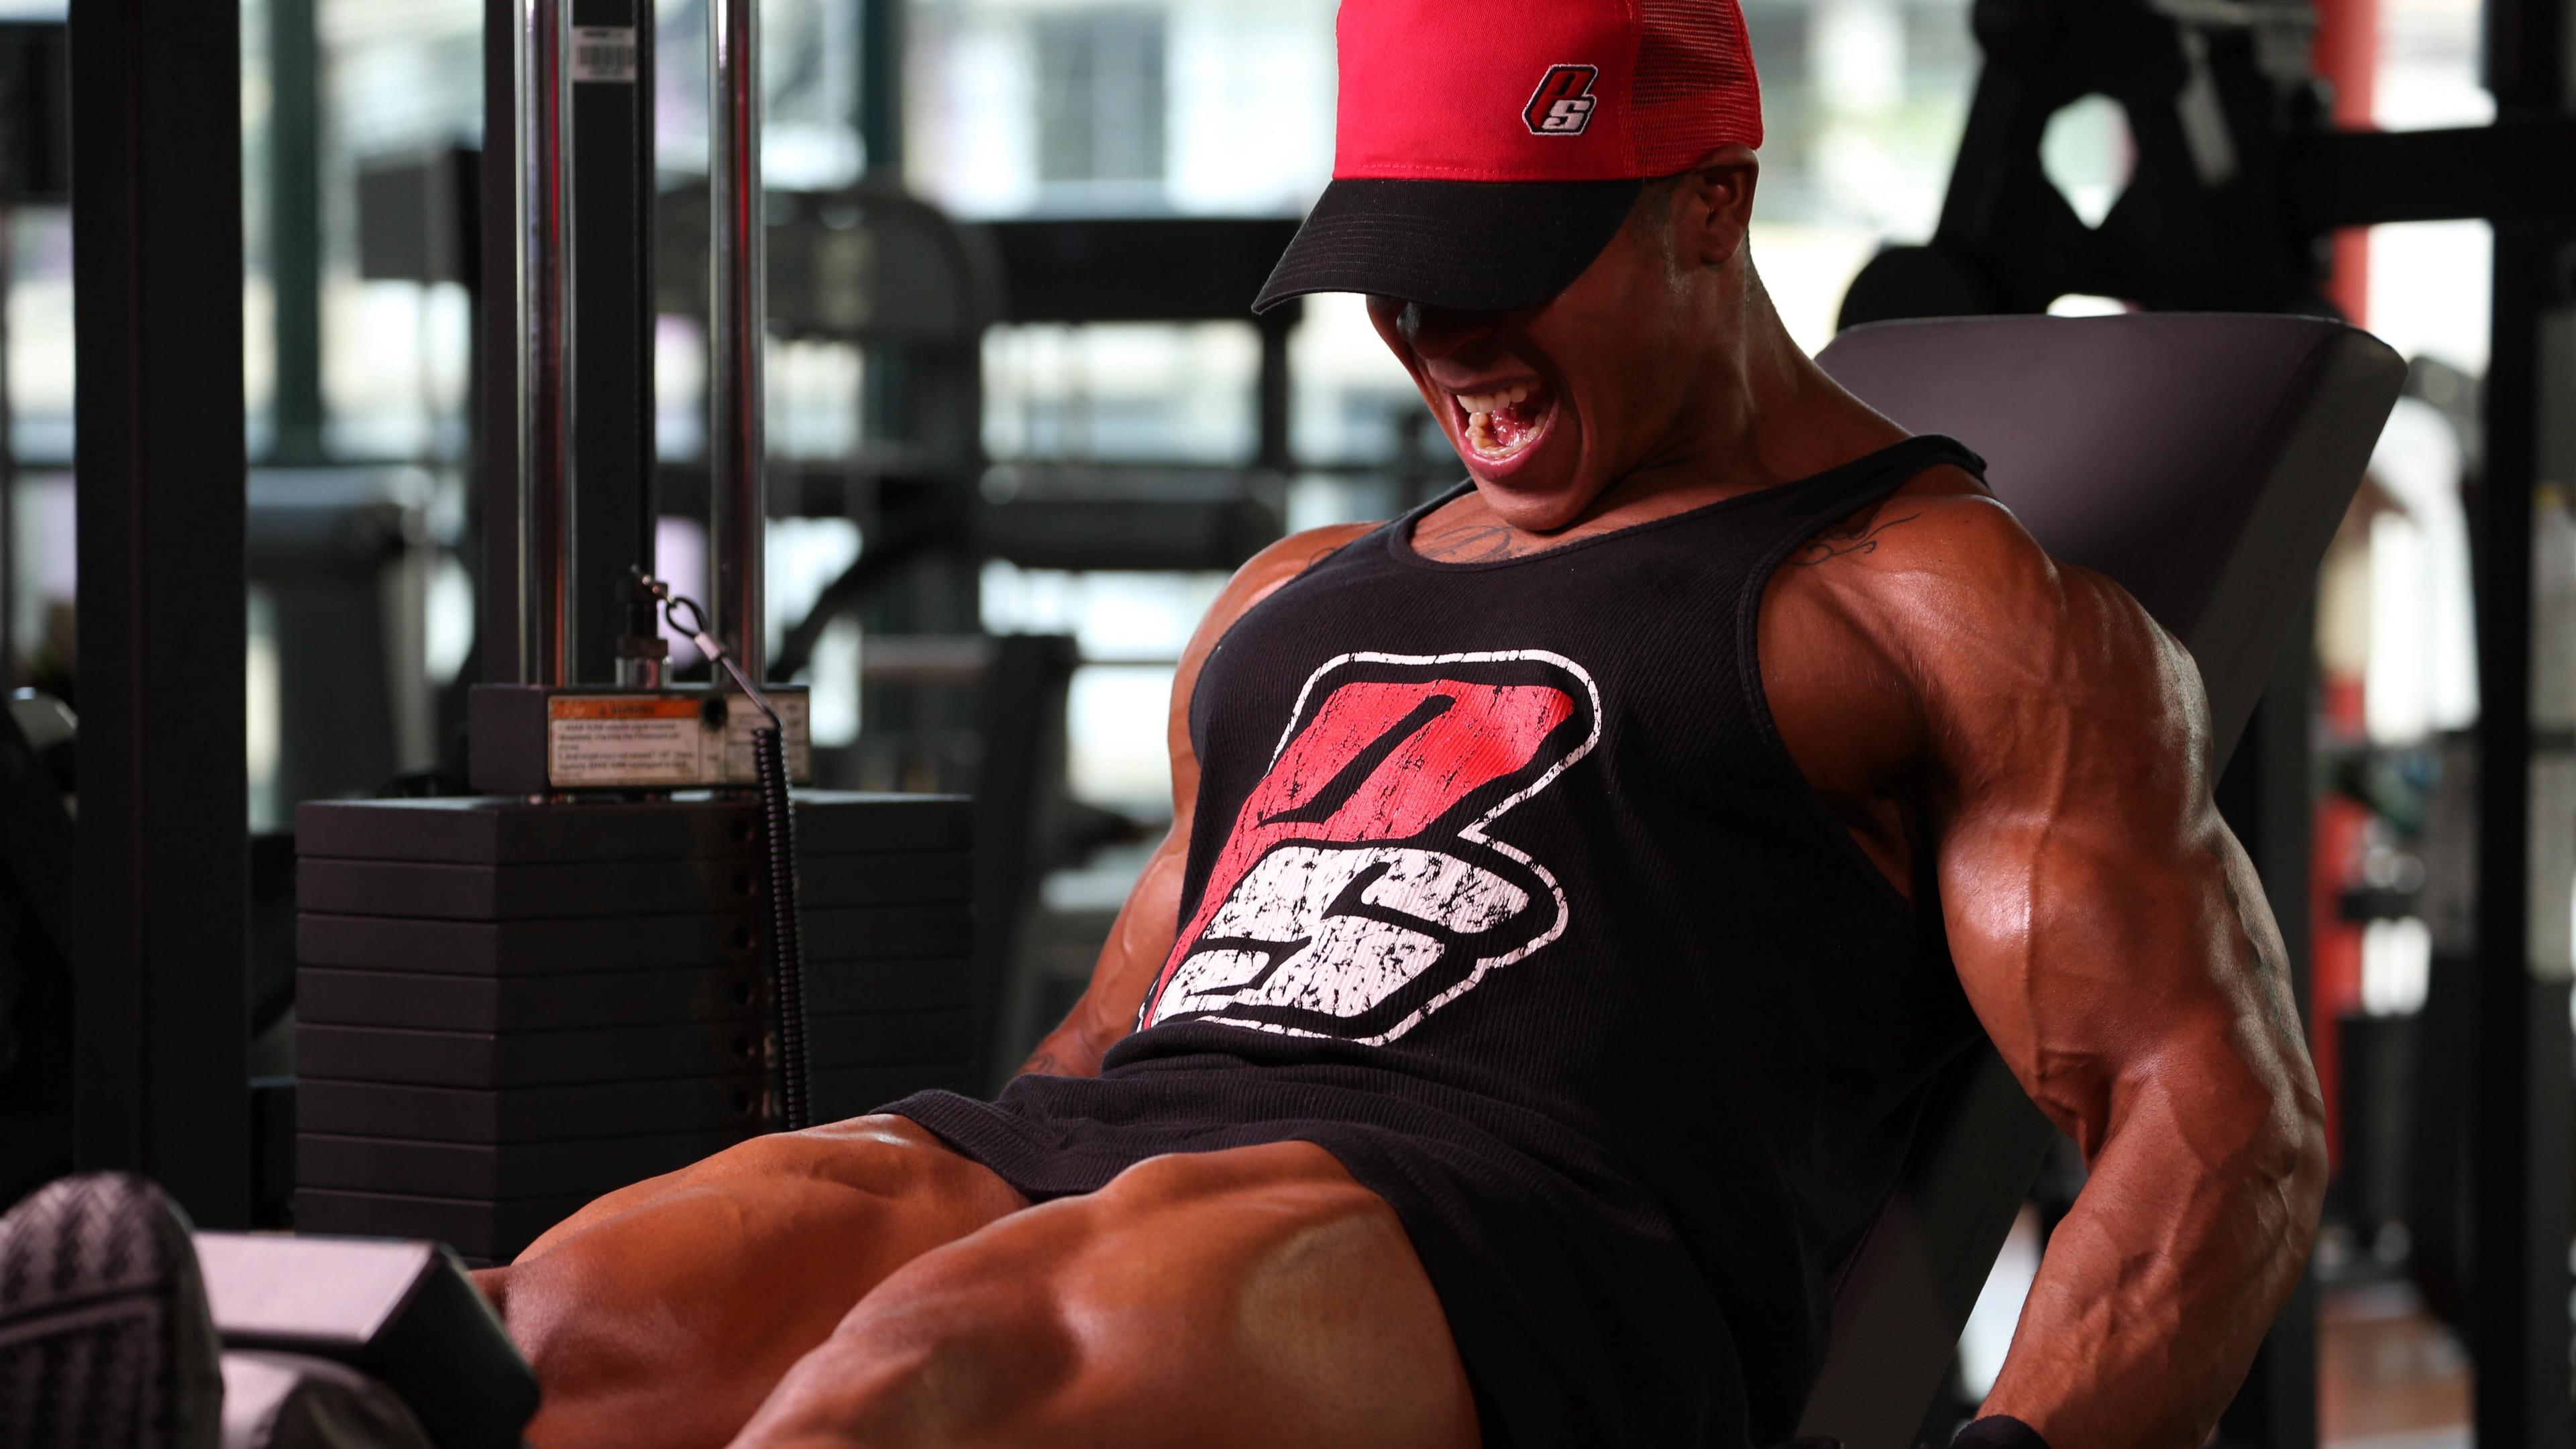 bodybuilding athlete exercise 4k 1540063184 - bodybuilding, athlete, exercise 4k - Exercise, bodybuilding, Athlete